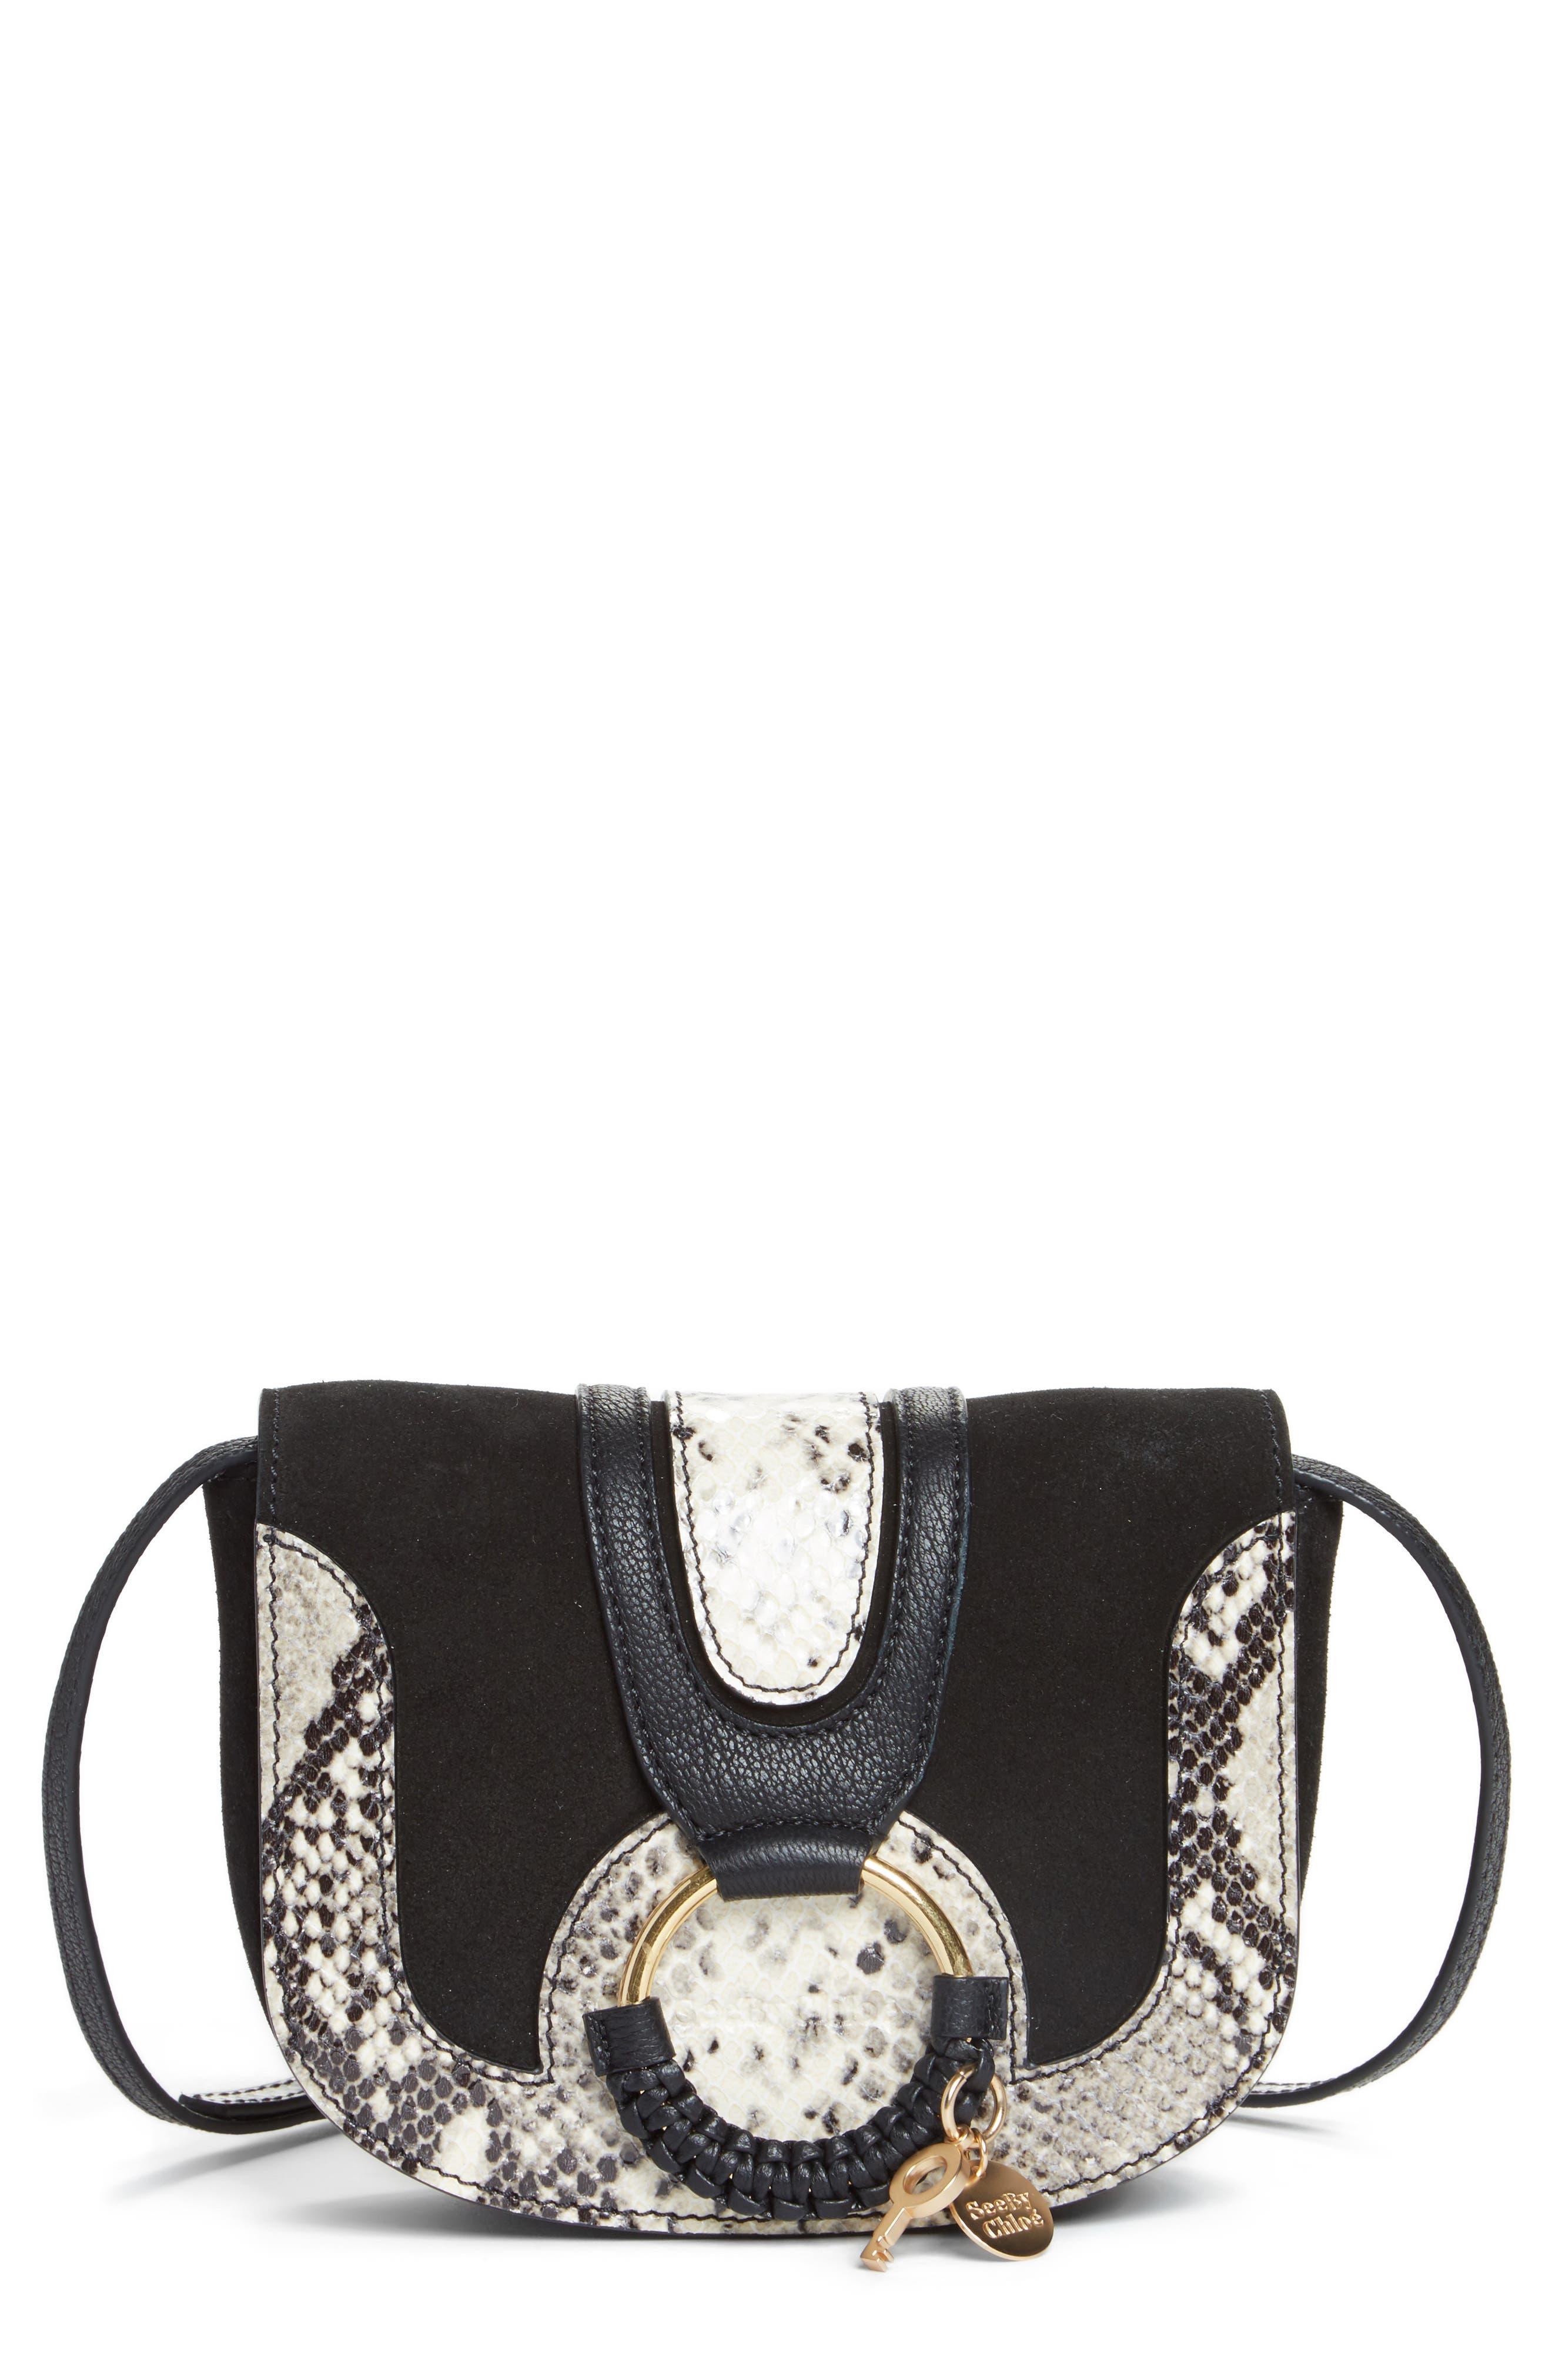 Main Image - See by Chloé Mini Hana Leather Crossbody Bag